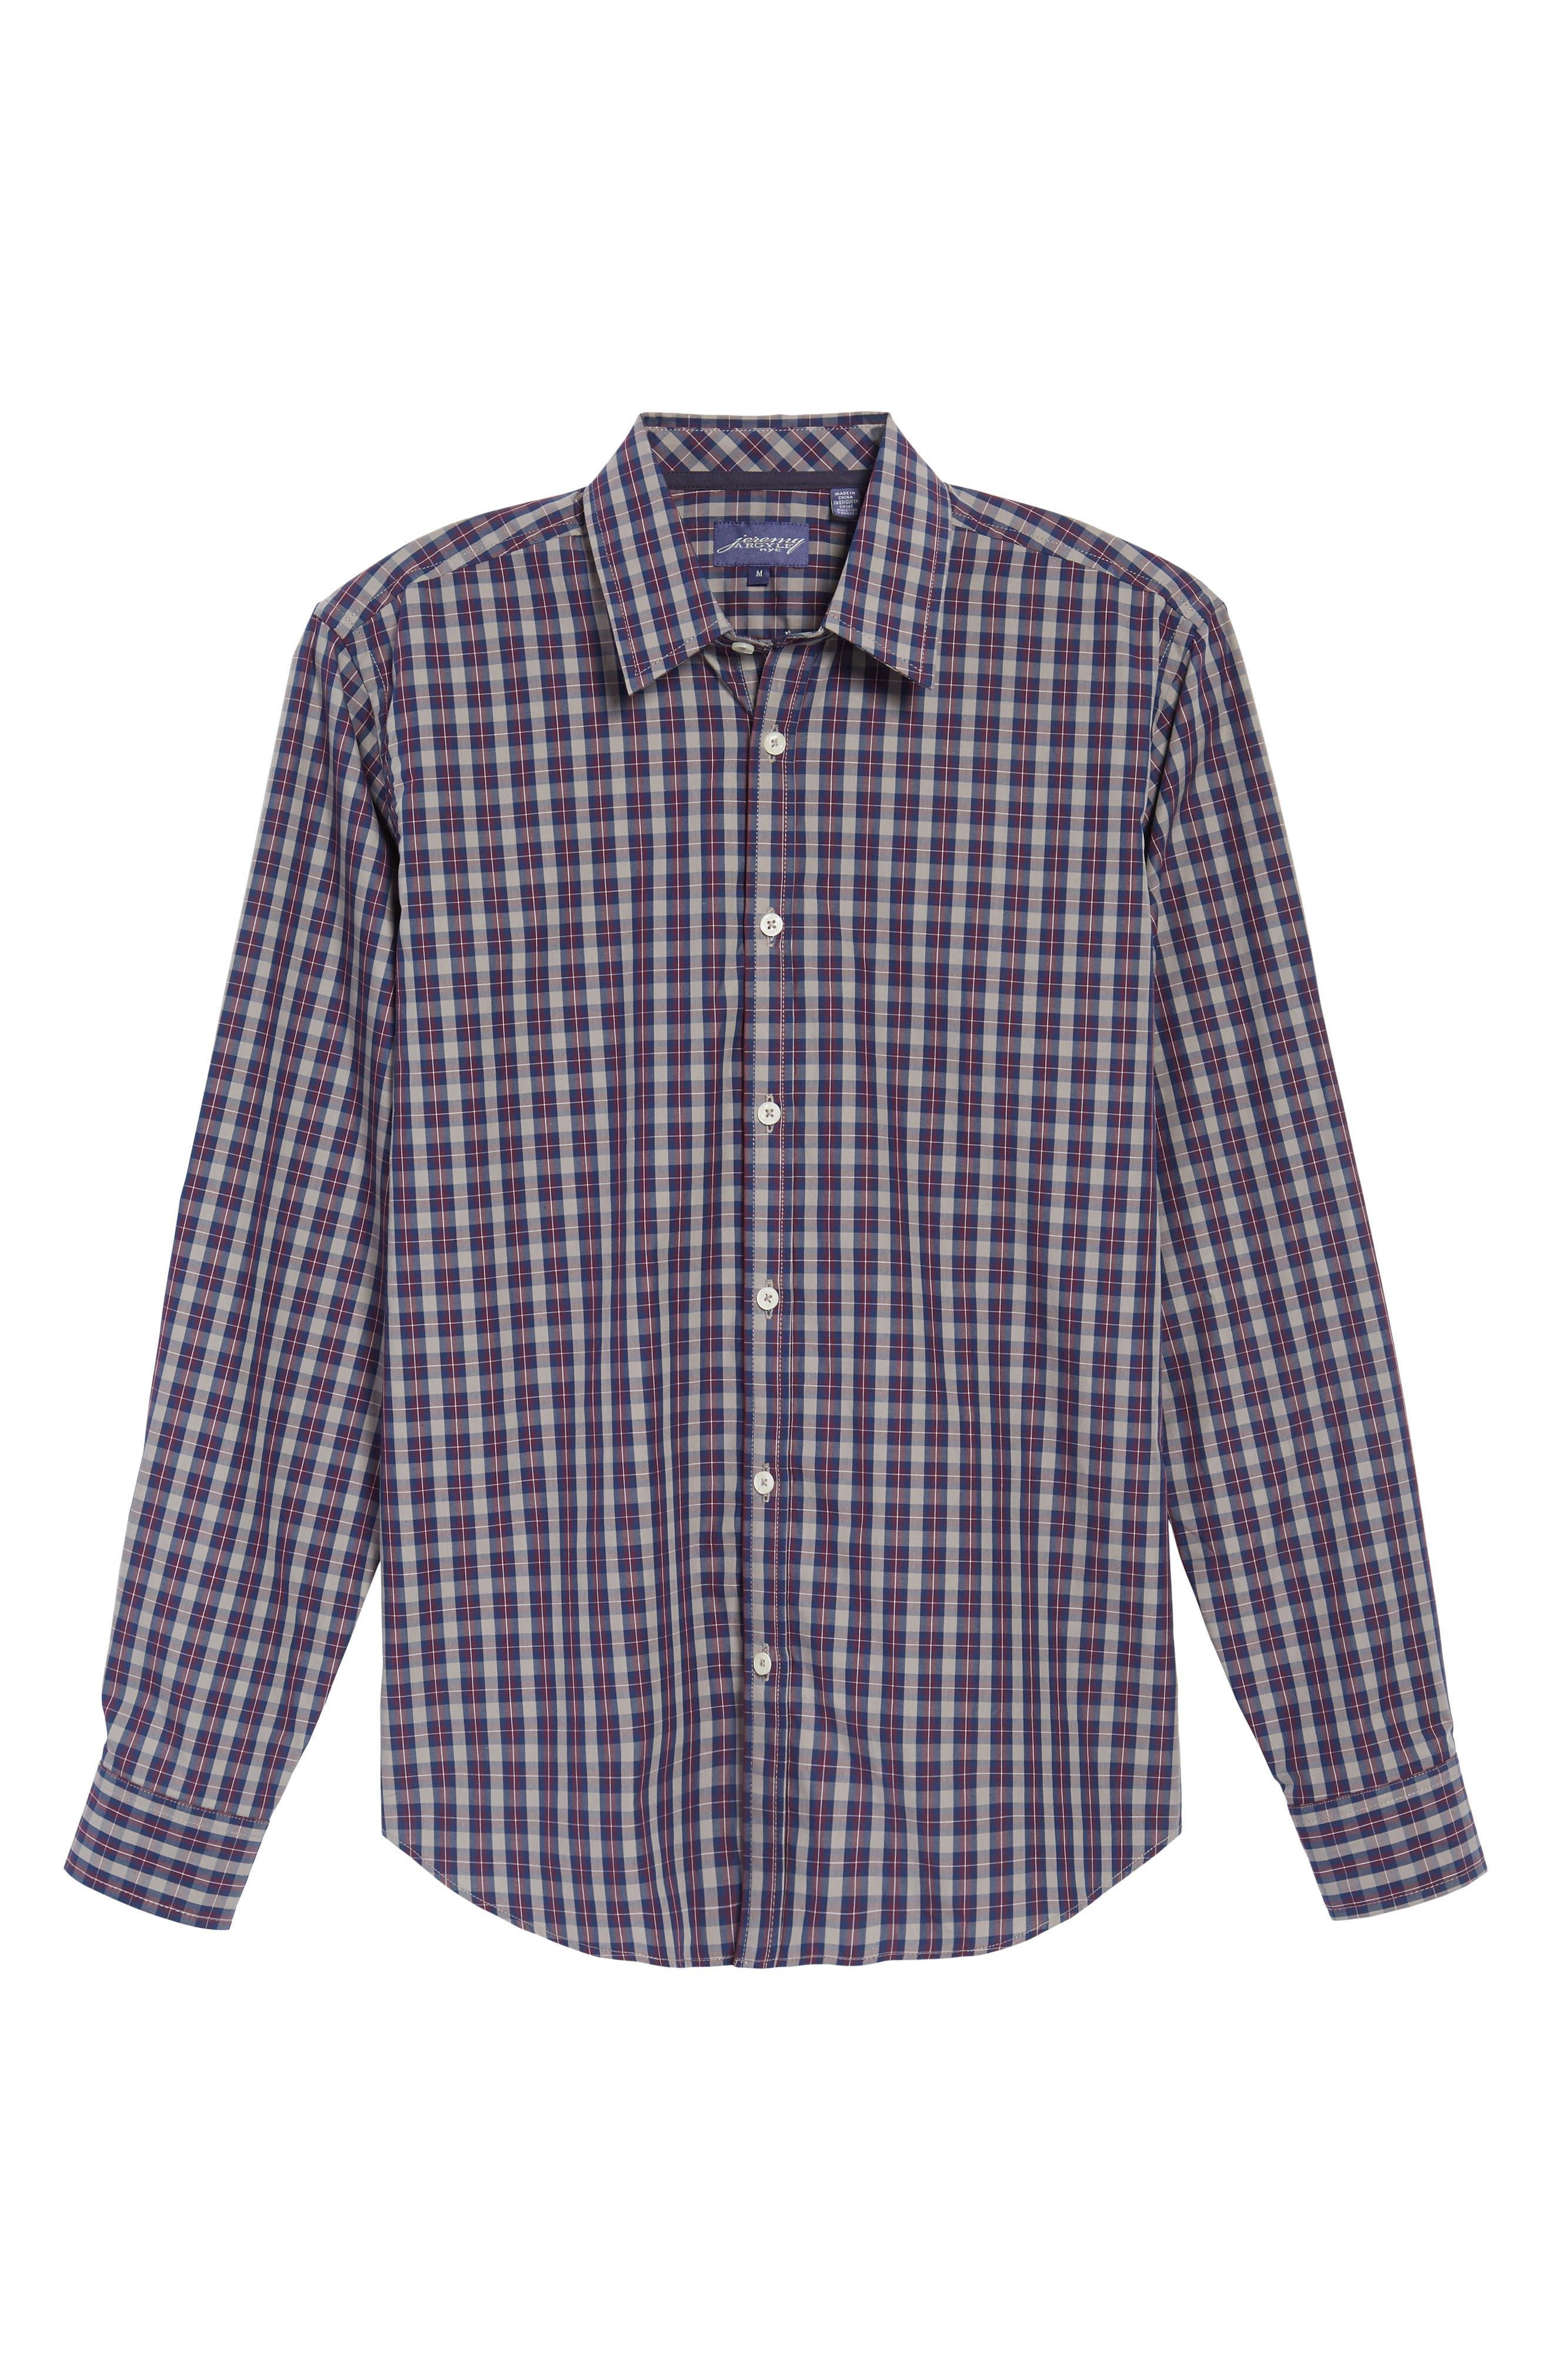 Regular Fit Plaid Sport Shirt,                             Alternate thumbnail 6, color,                             930